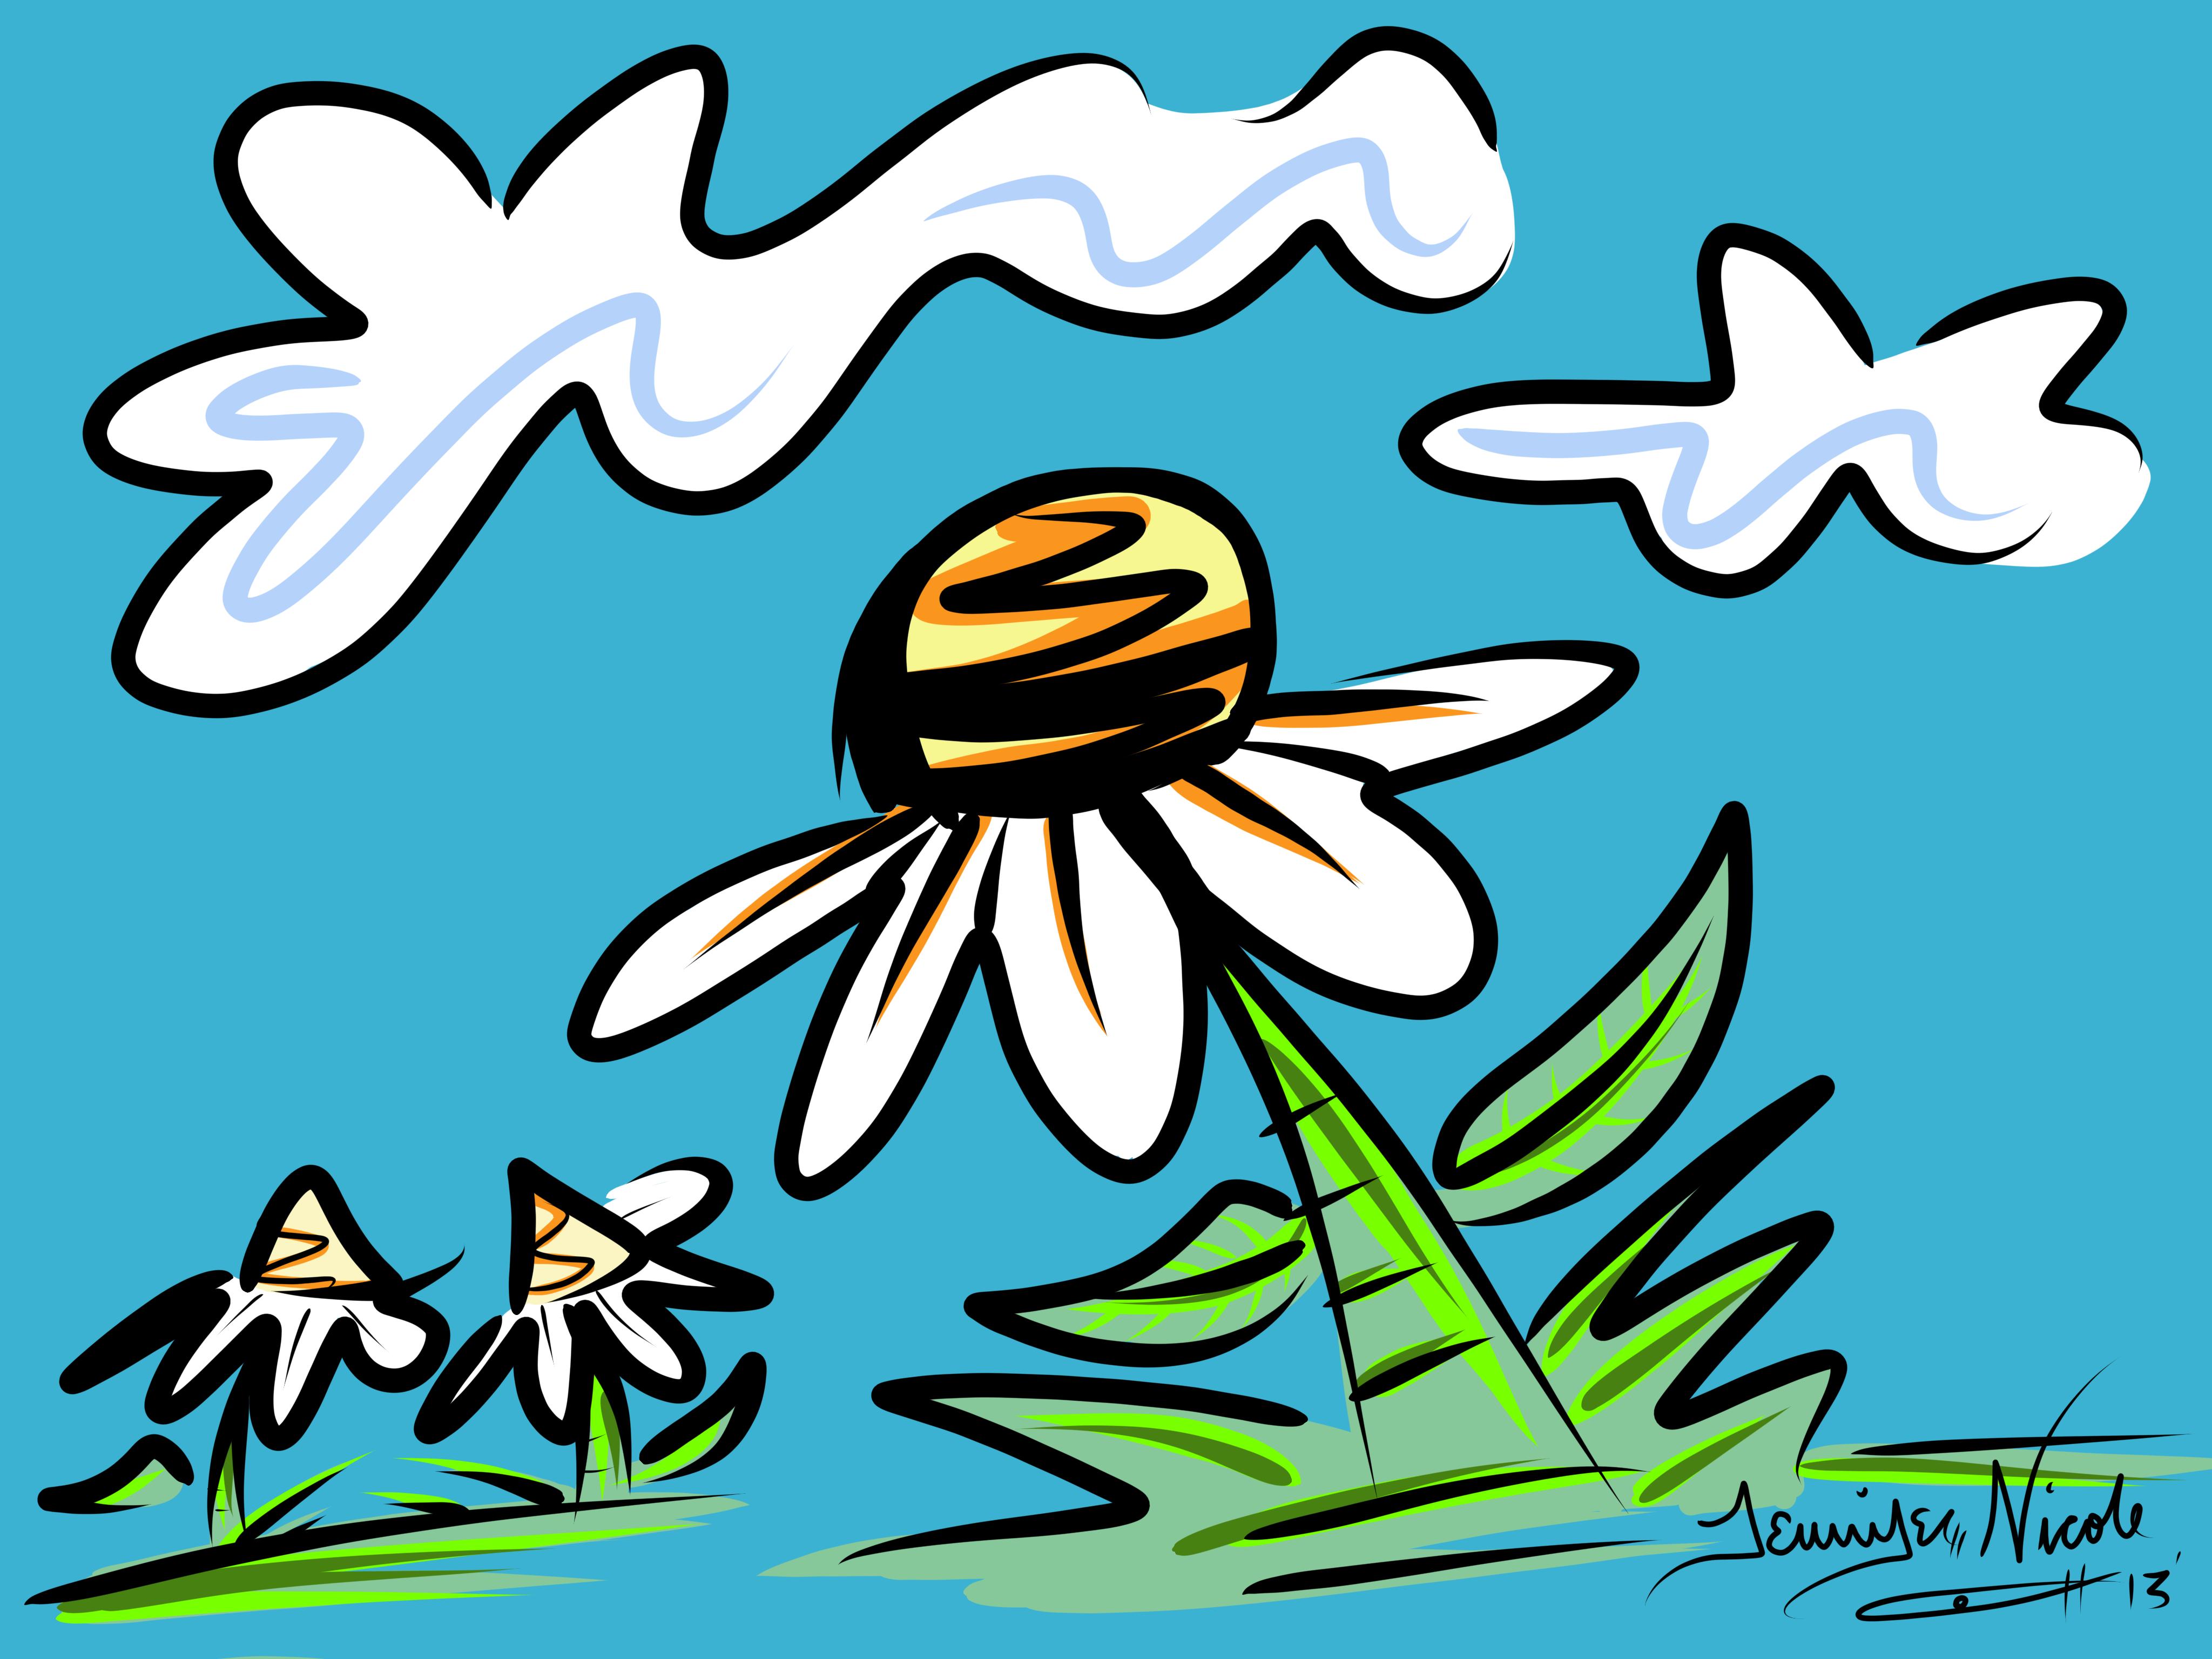 1-5-13 Flowers